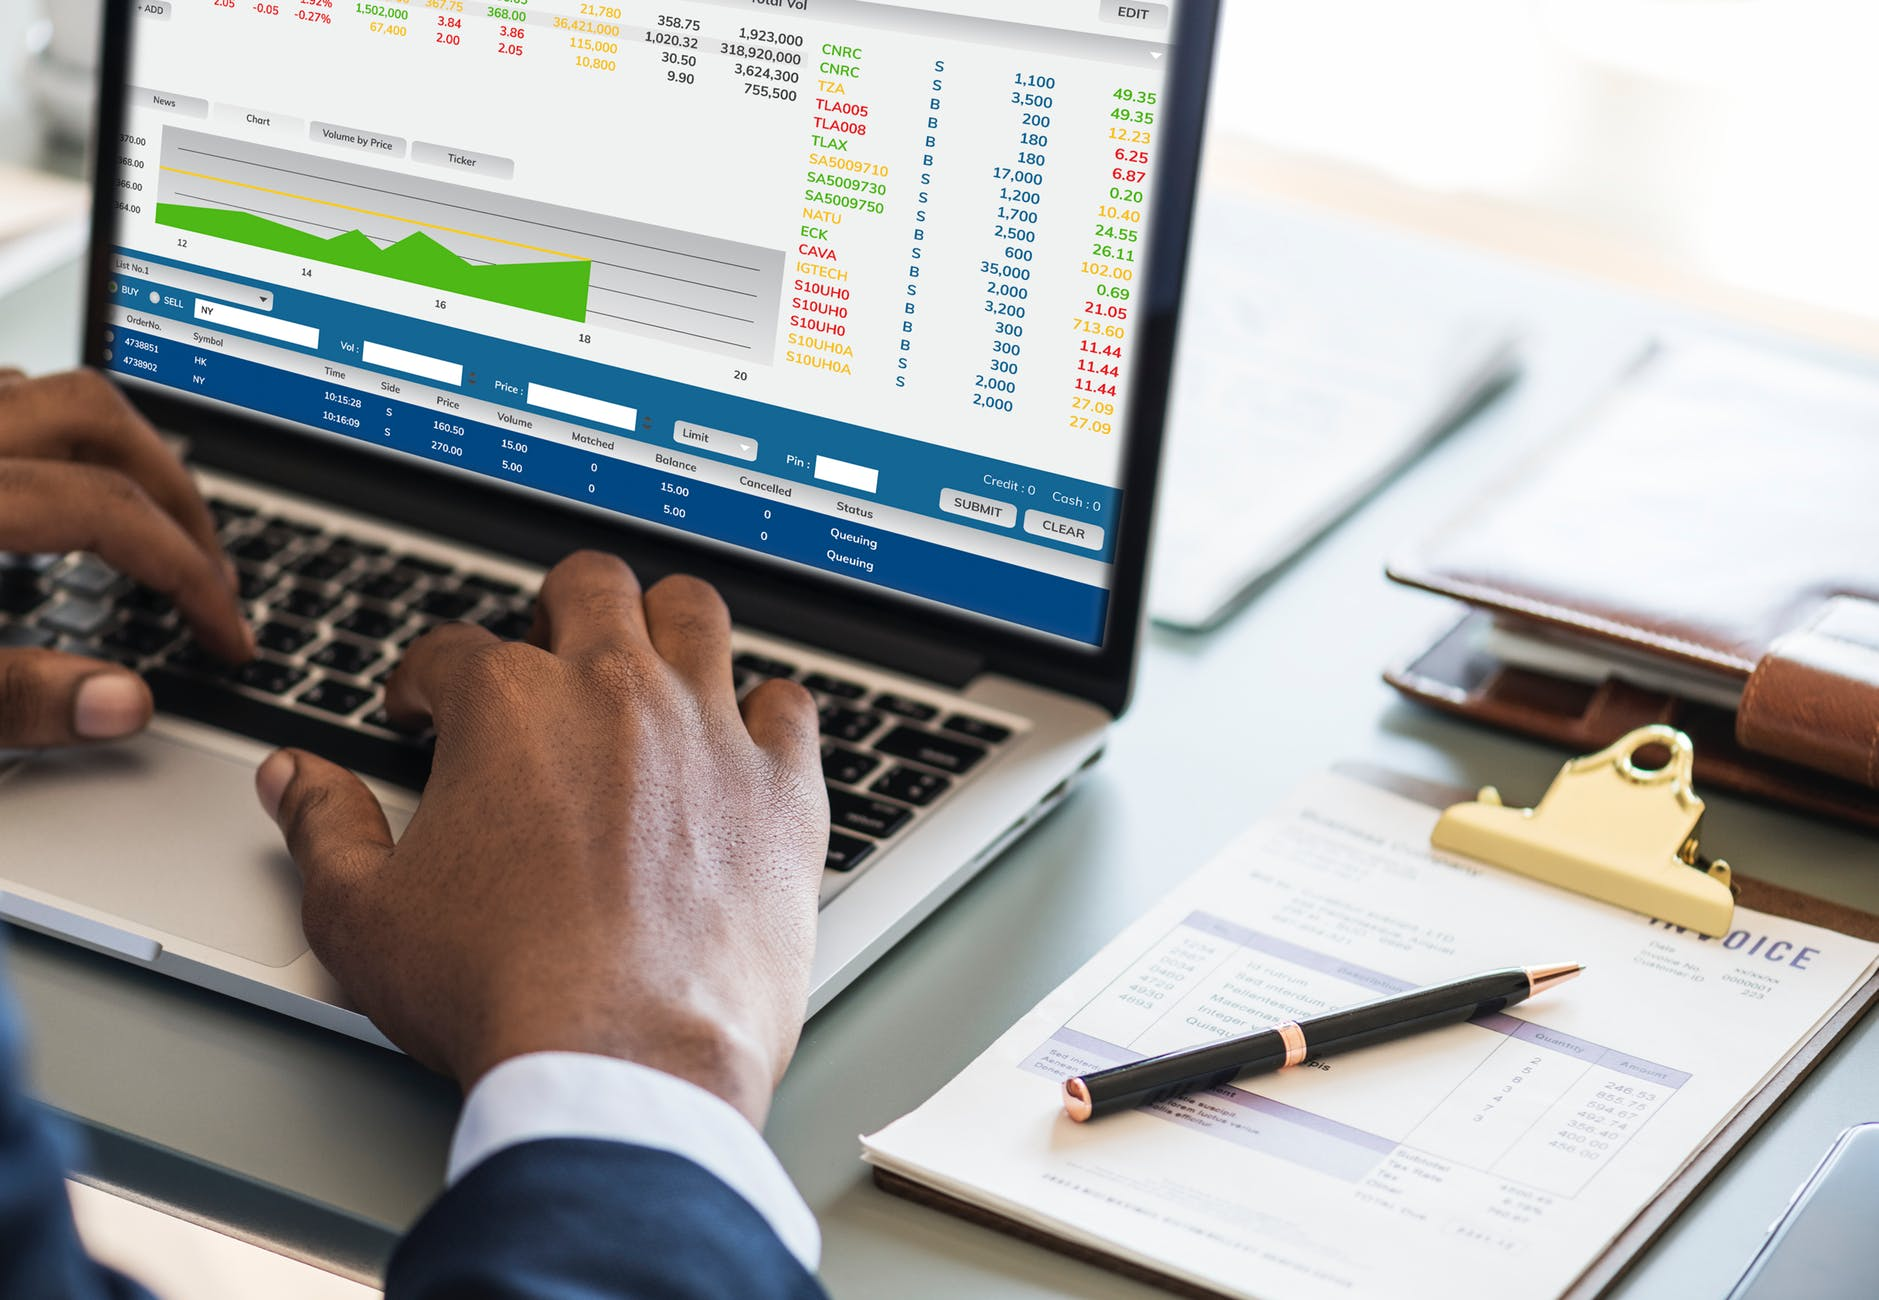 Accounts Payable Fraud Control